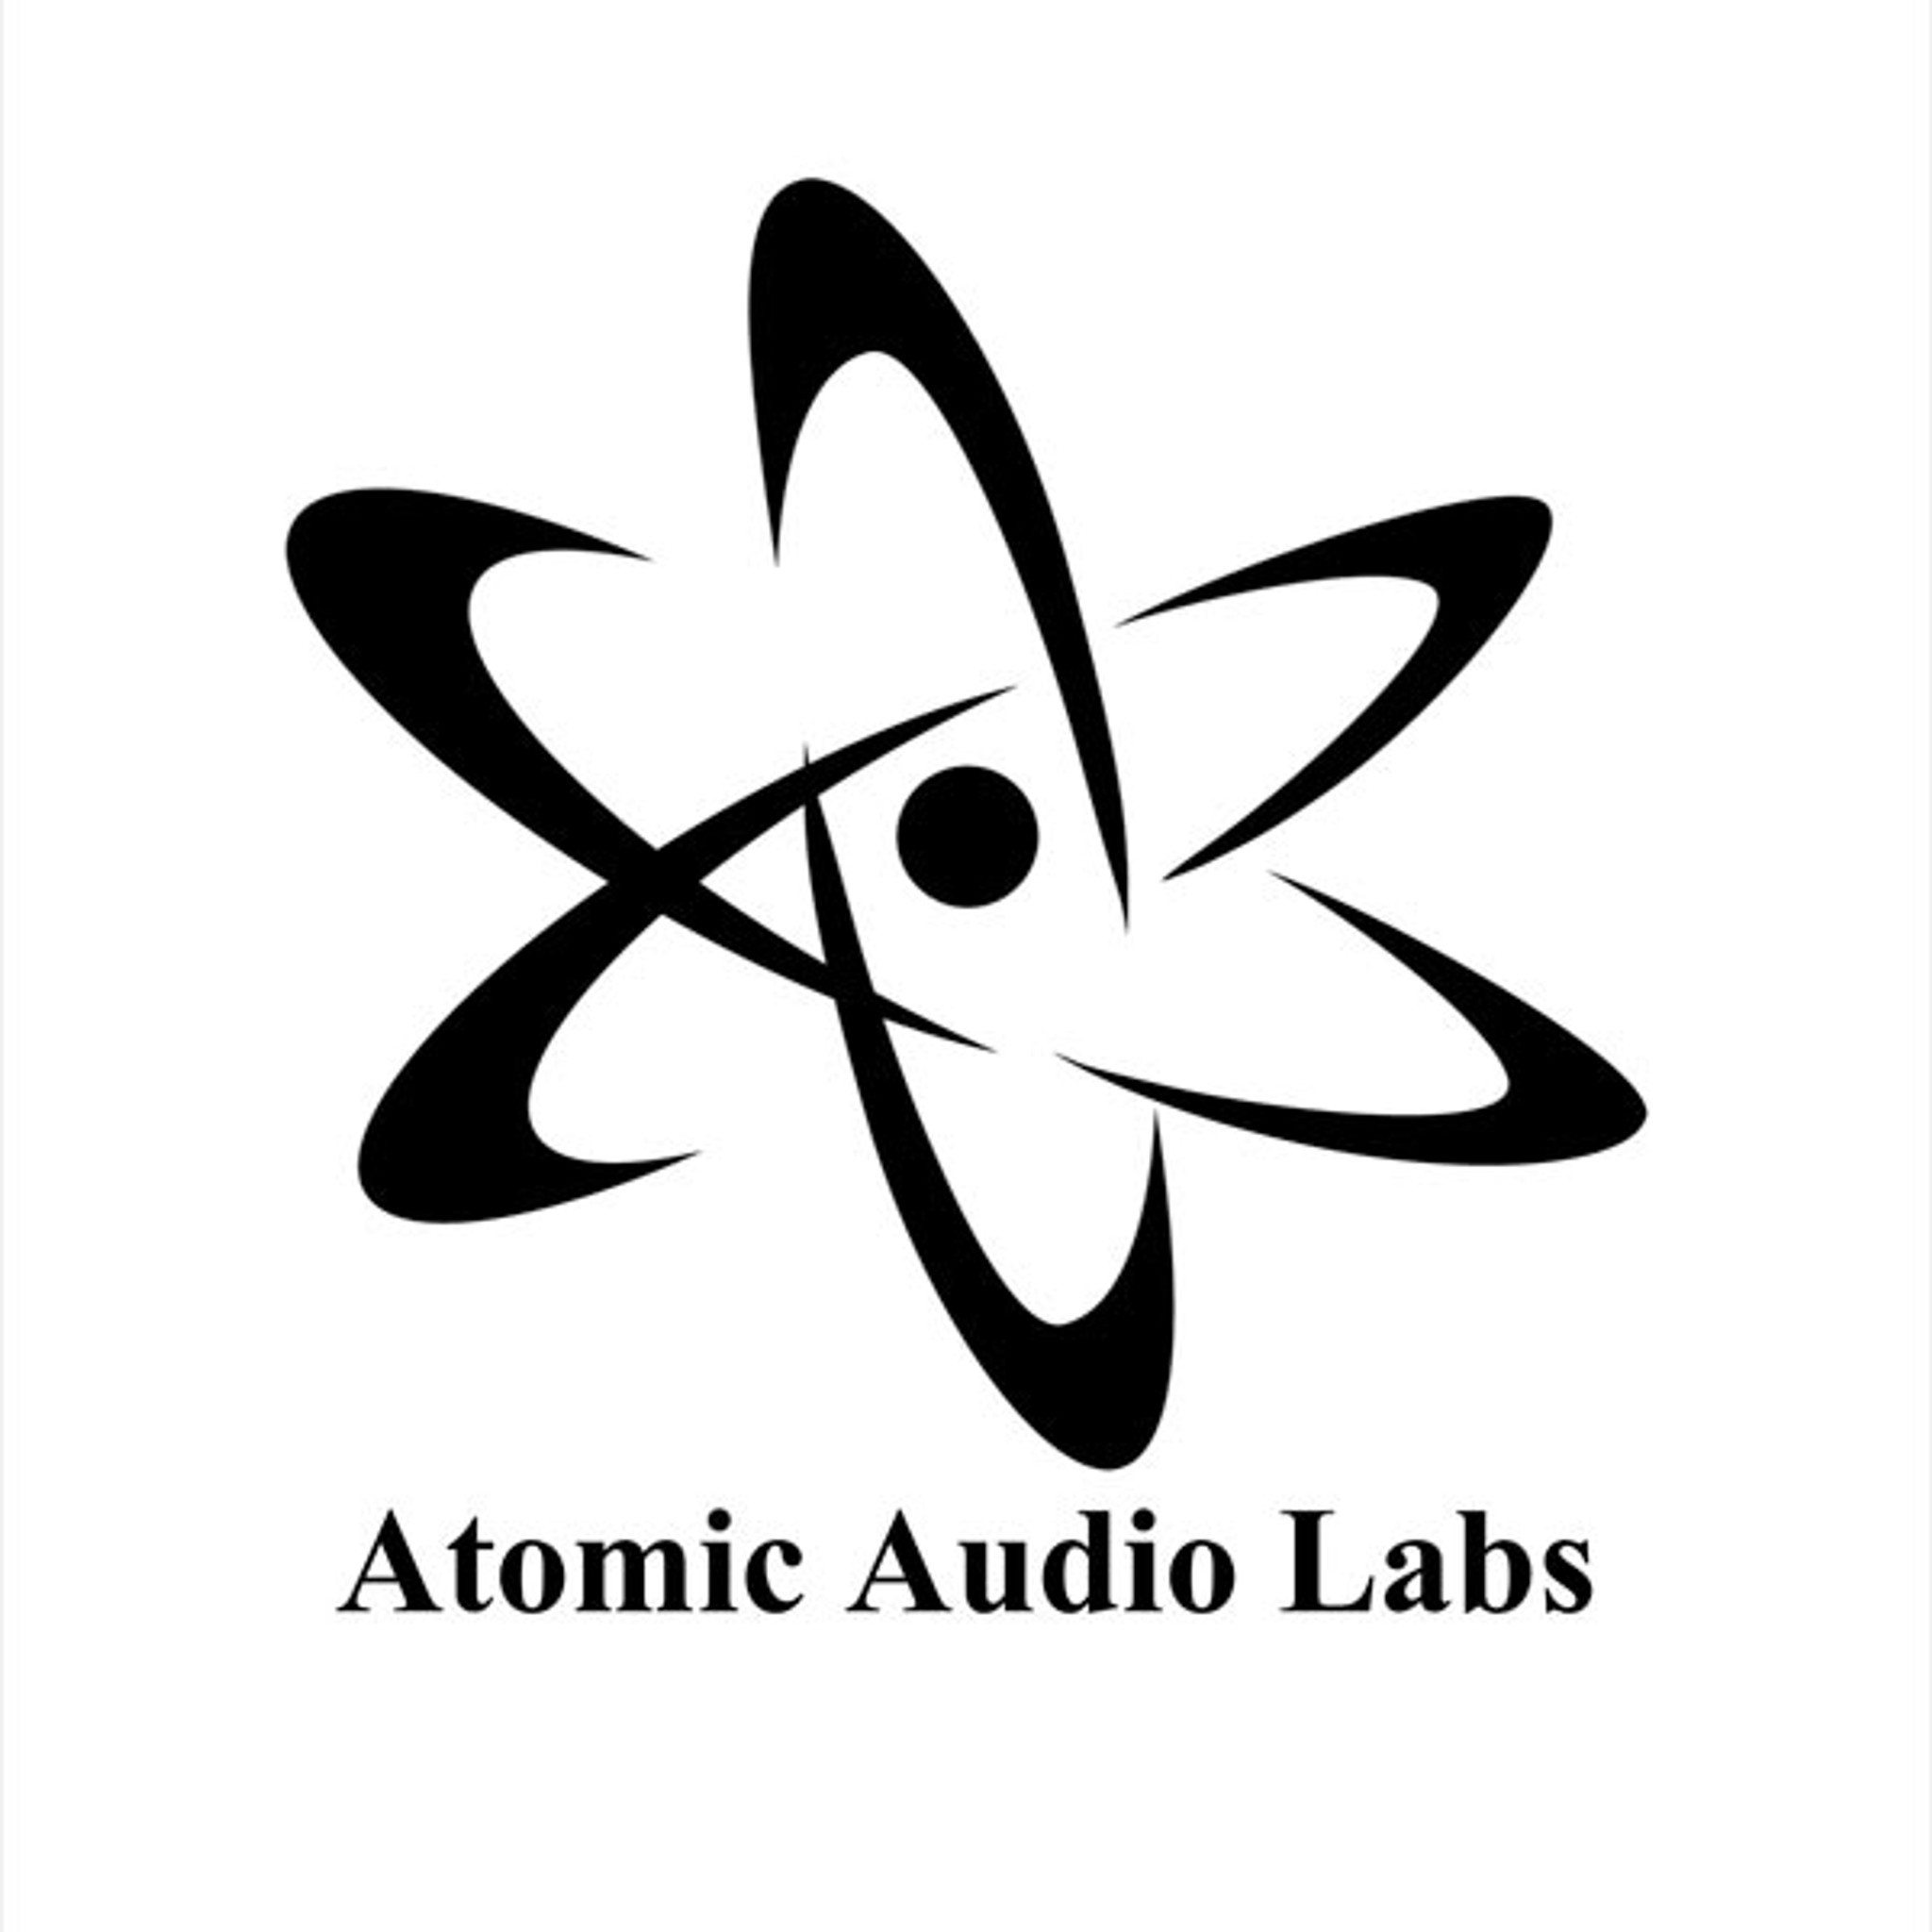 Atomic Audio Labs